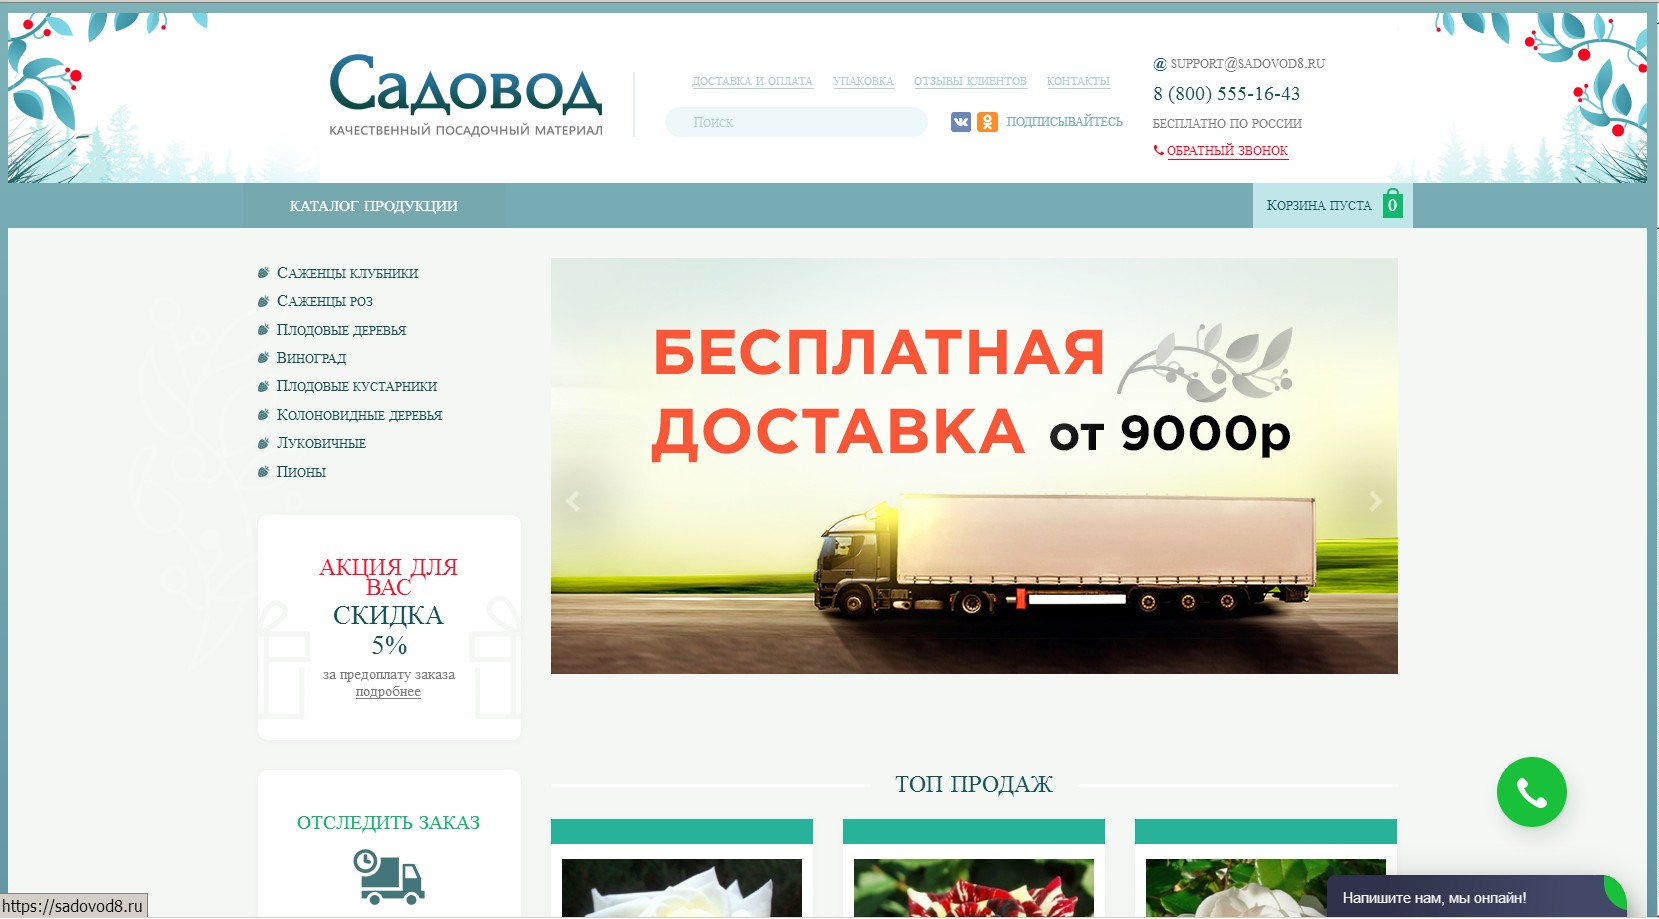 Скриншот интернет-магазина sadovod8.ru